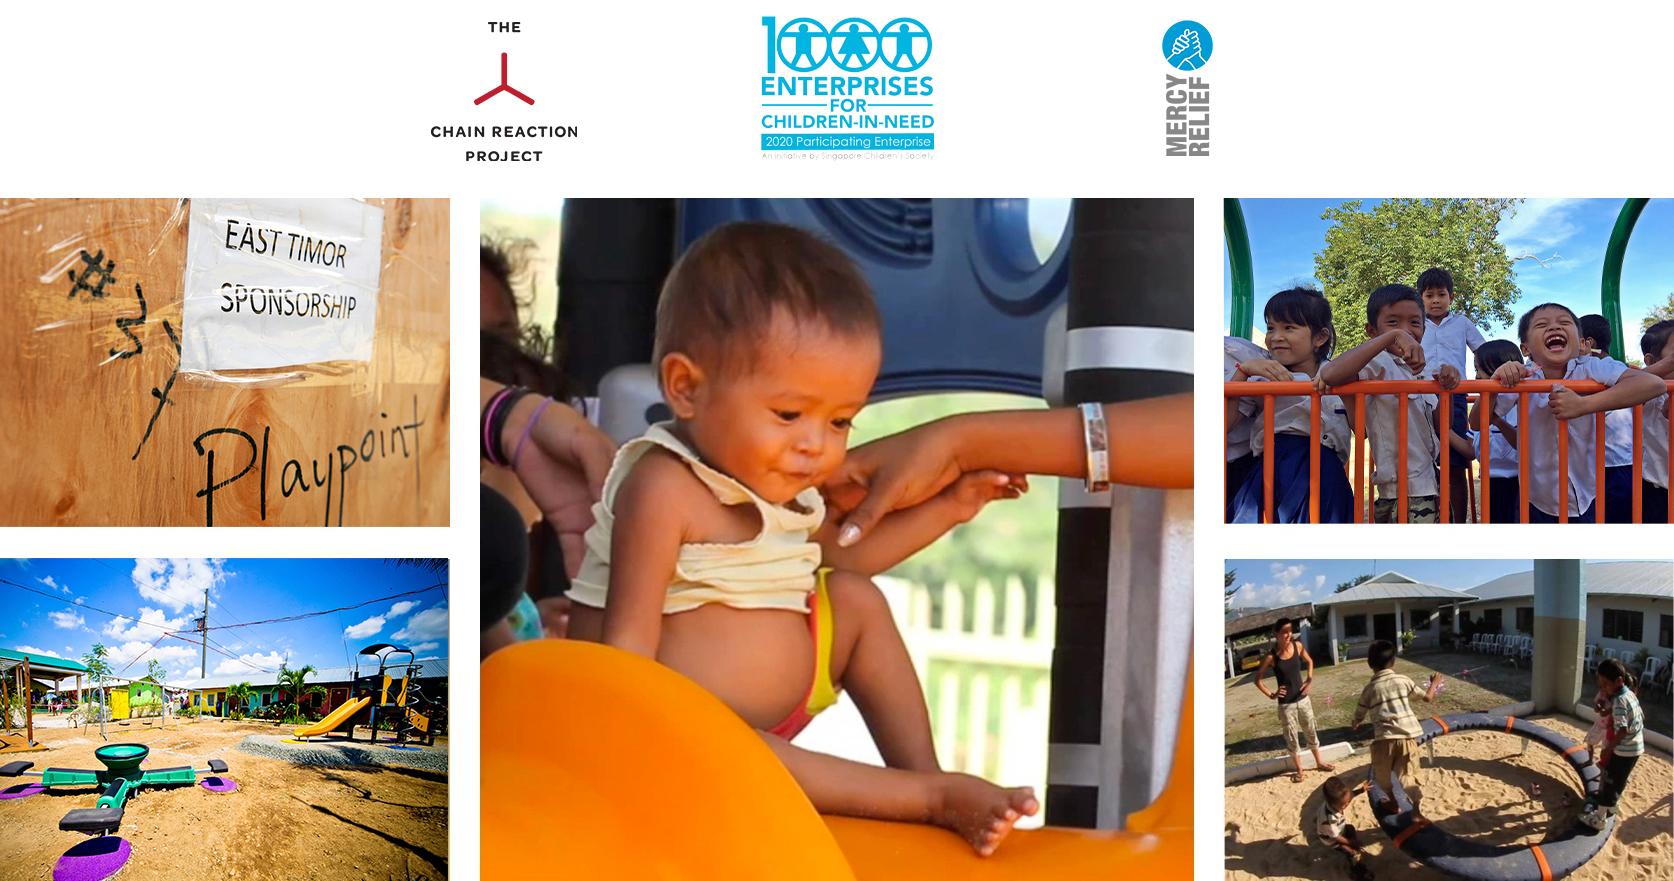 CSR-image3.jpg